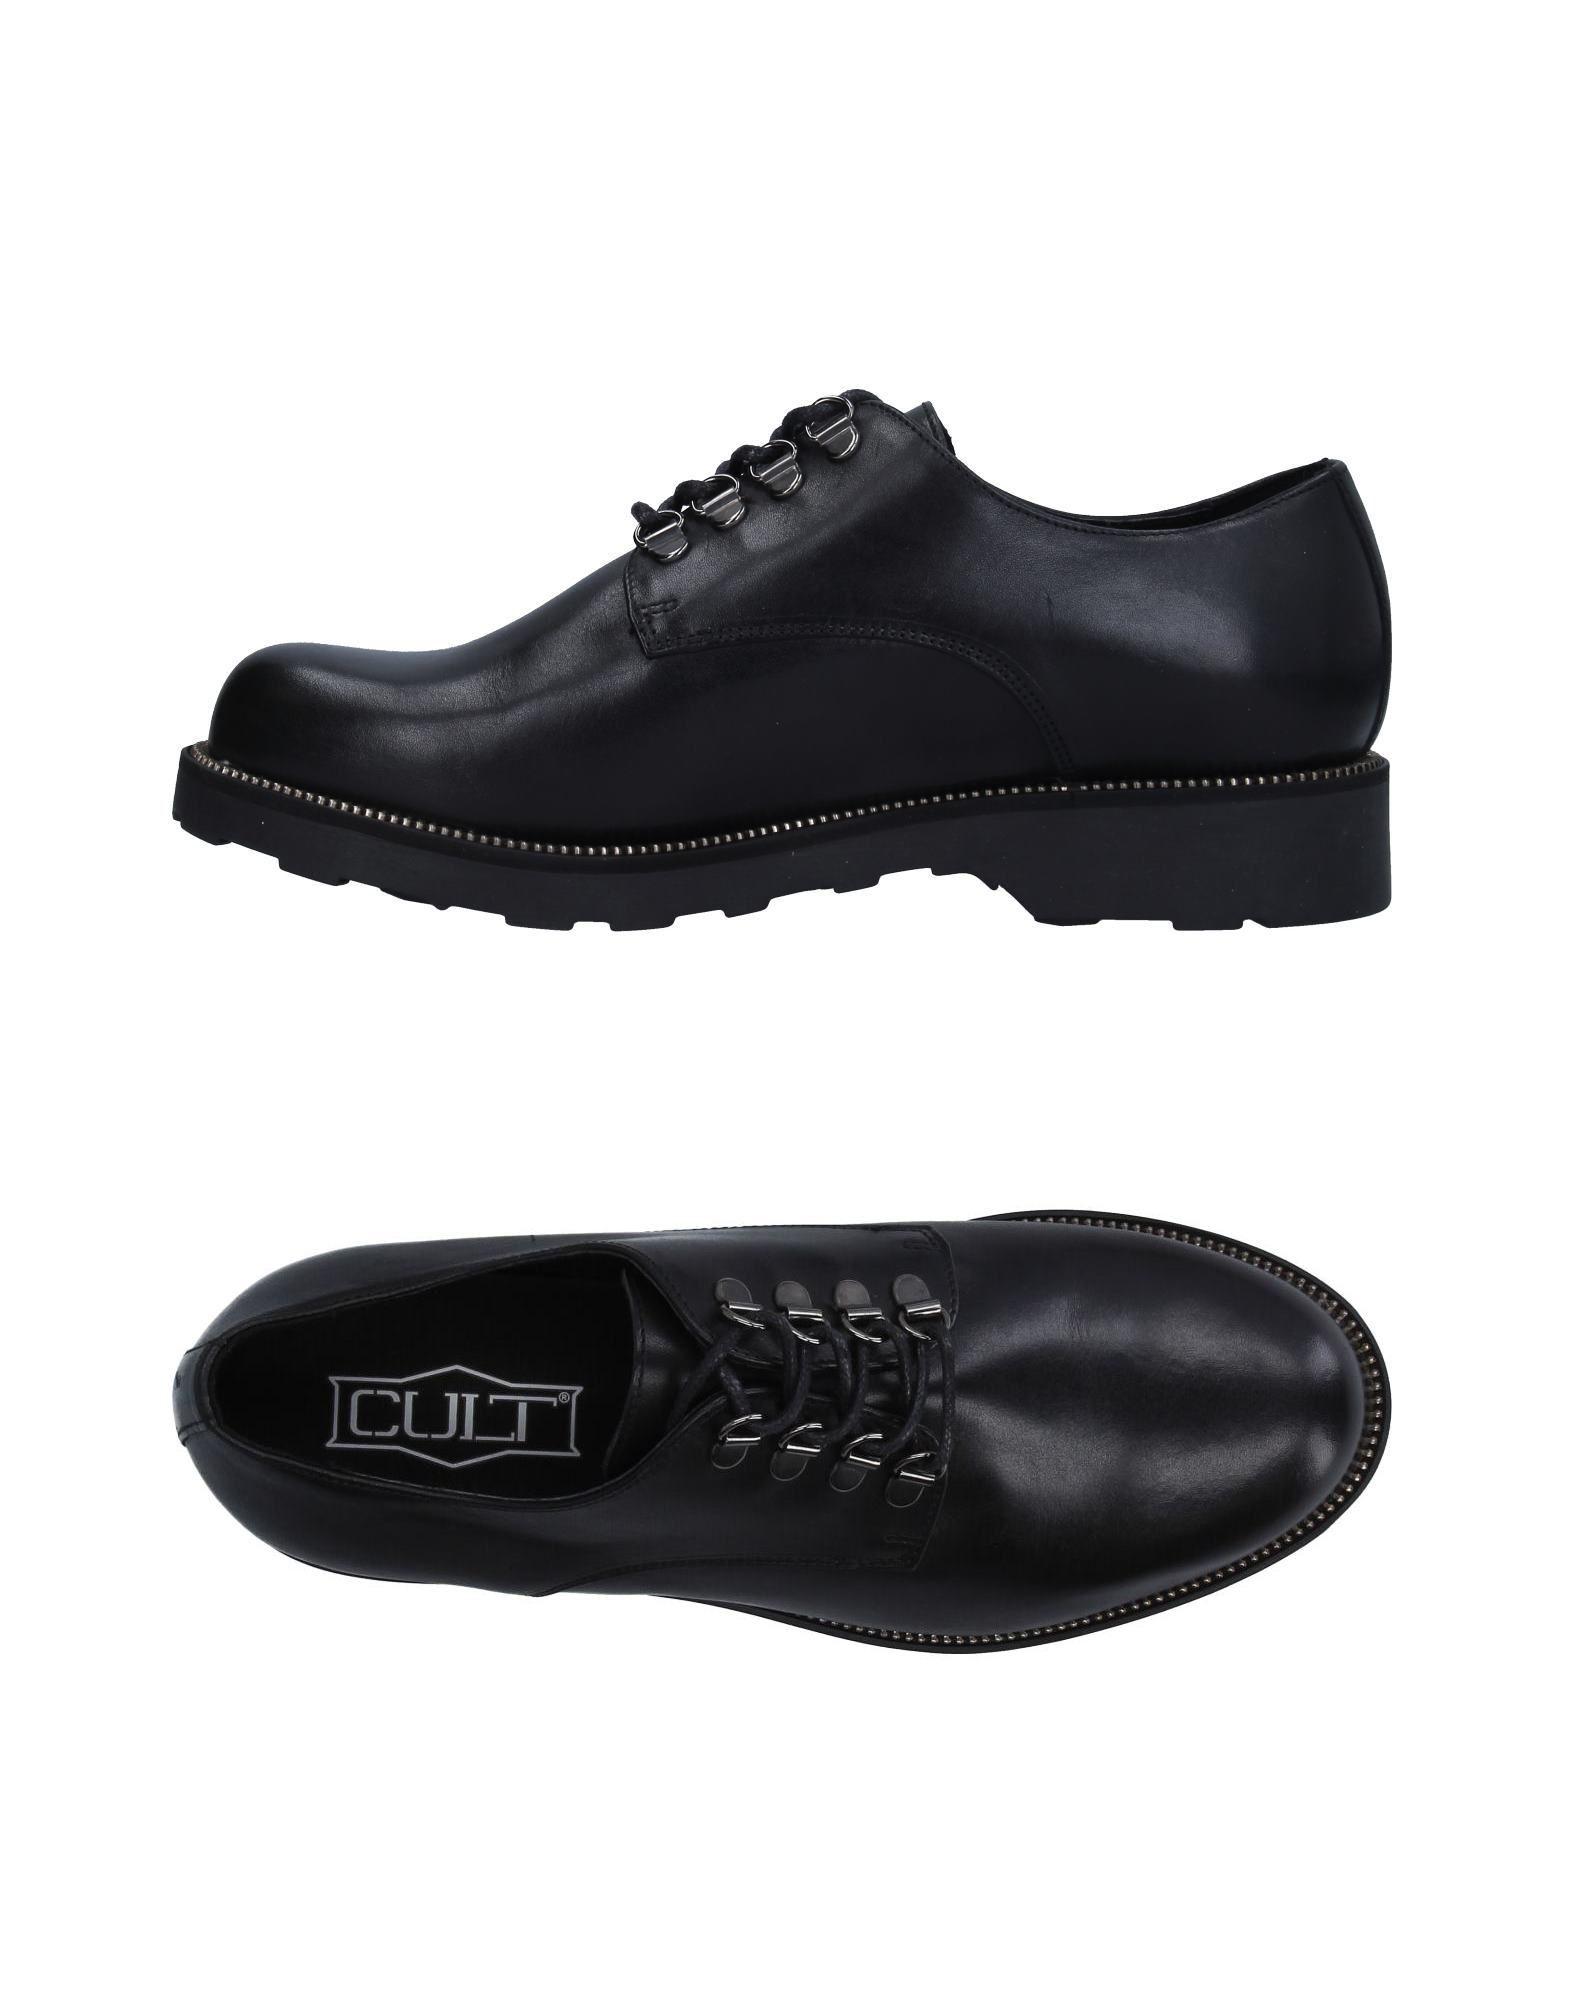 Rabatt echte Schuhe Cult Schnürschuhe Herren  11298760IS